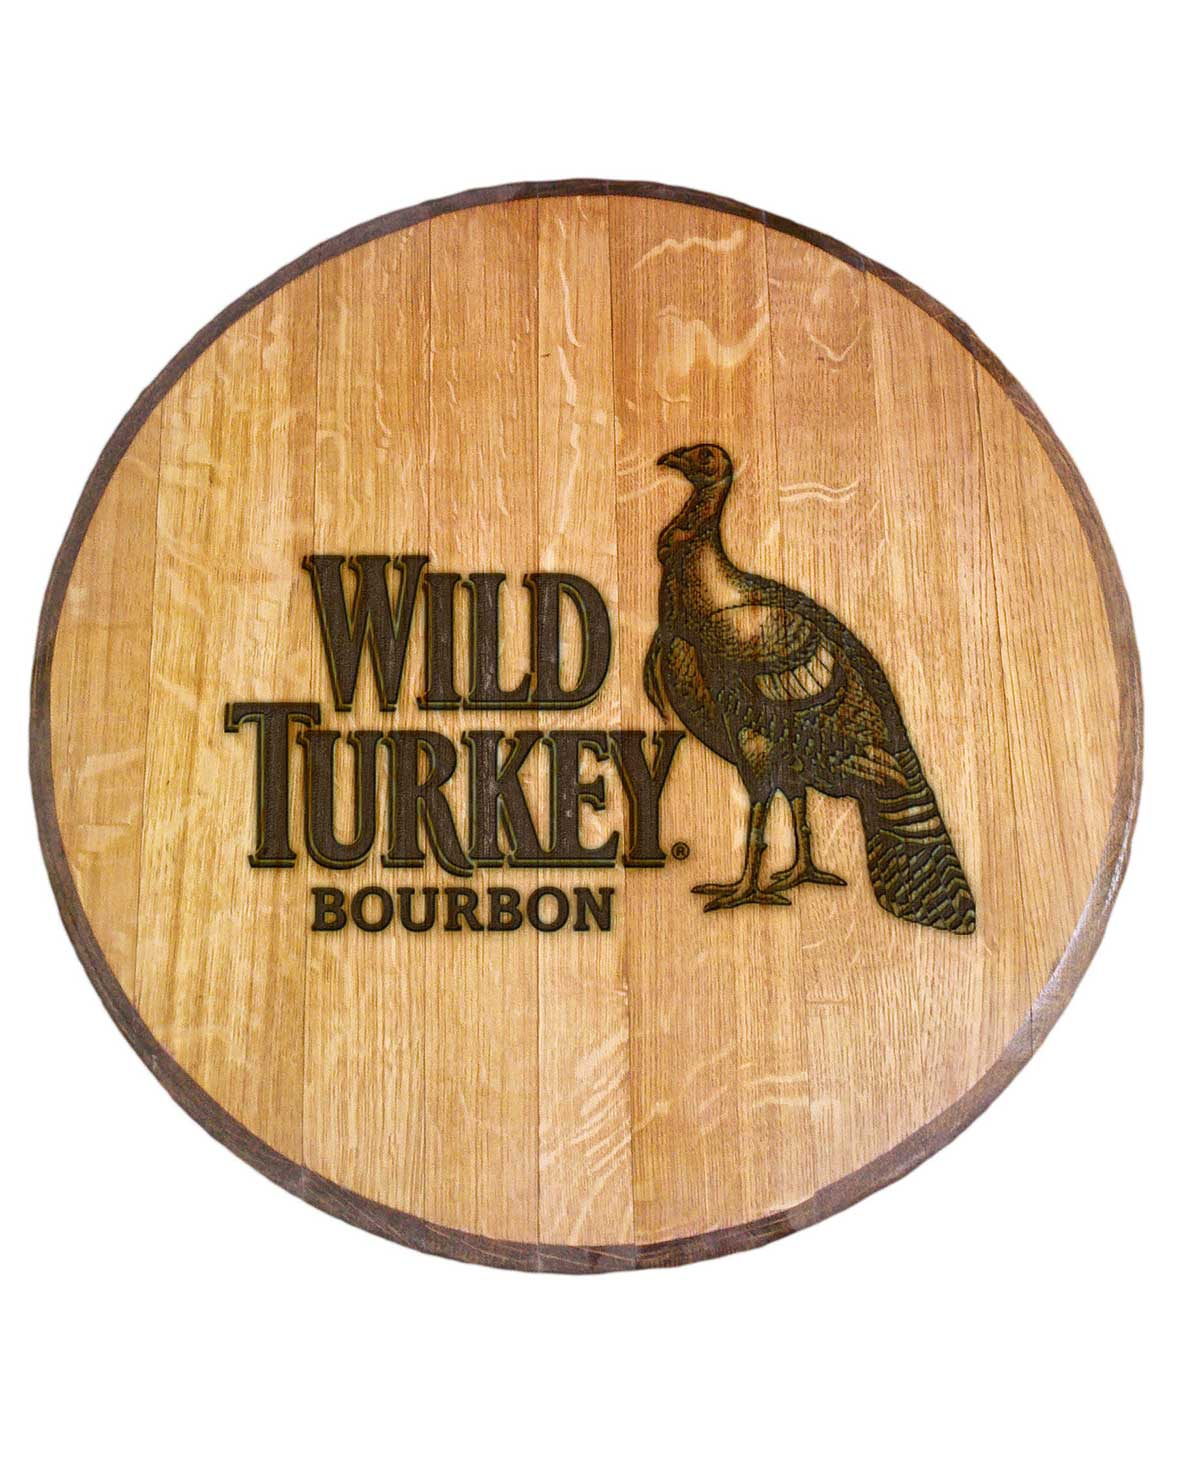 Wild Turkey Bourbon Barrel Head